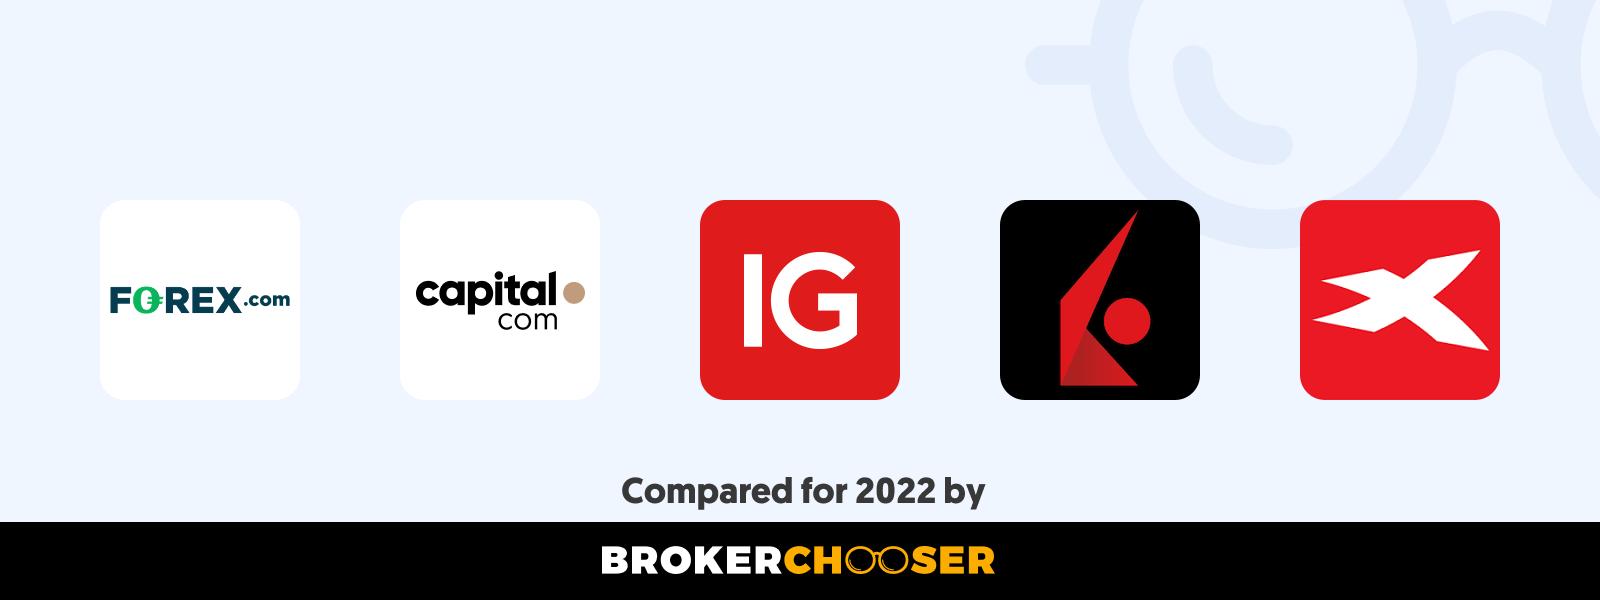 Best forex brokers for beginners in Zambia in 2021